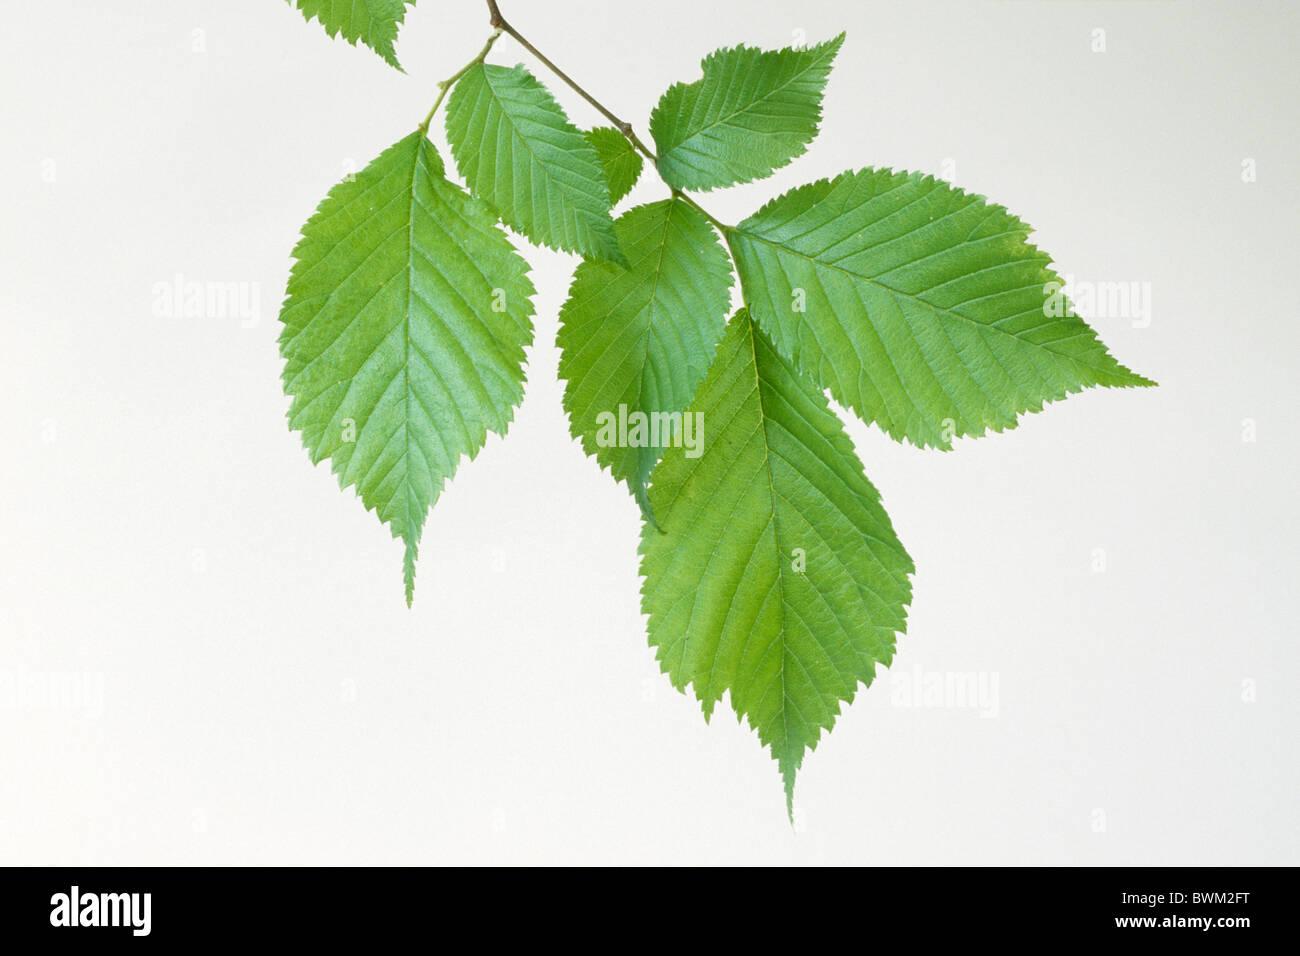 European Field Elm (Ulmus minor), twig with leaves, studio picture. - Stock Image